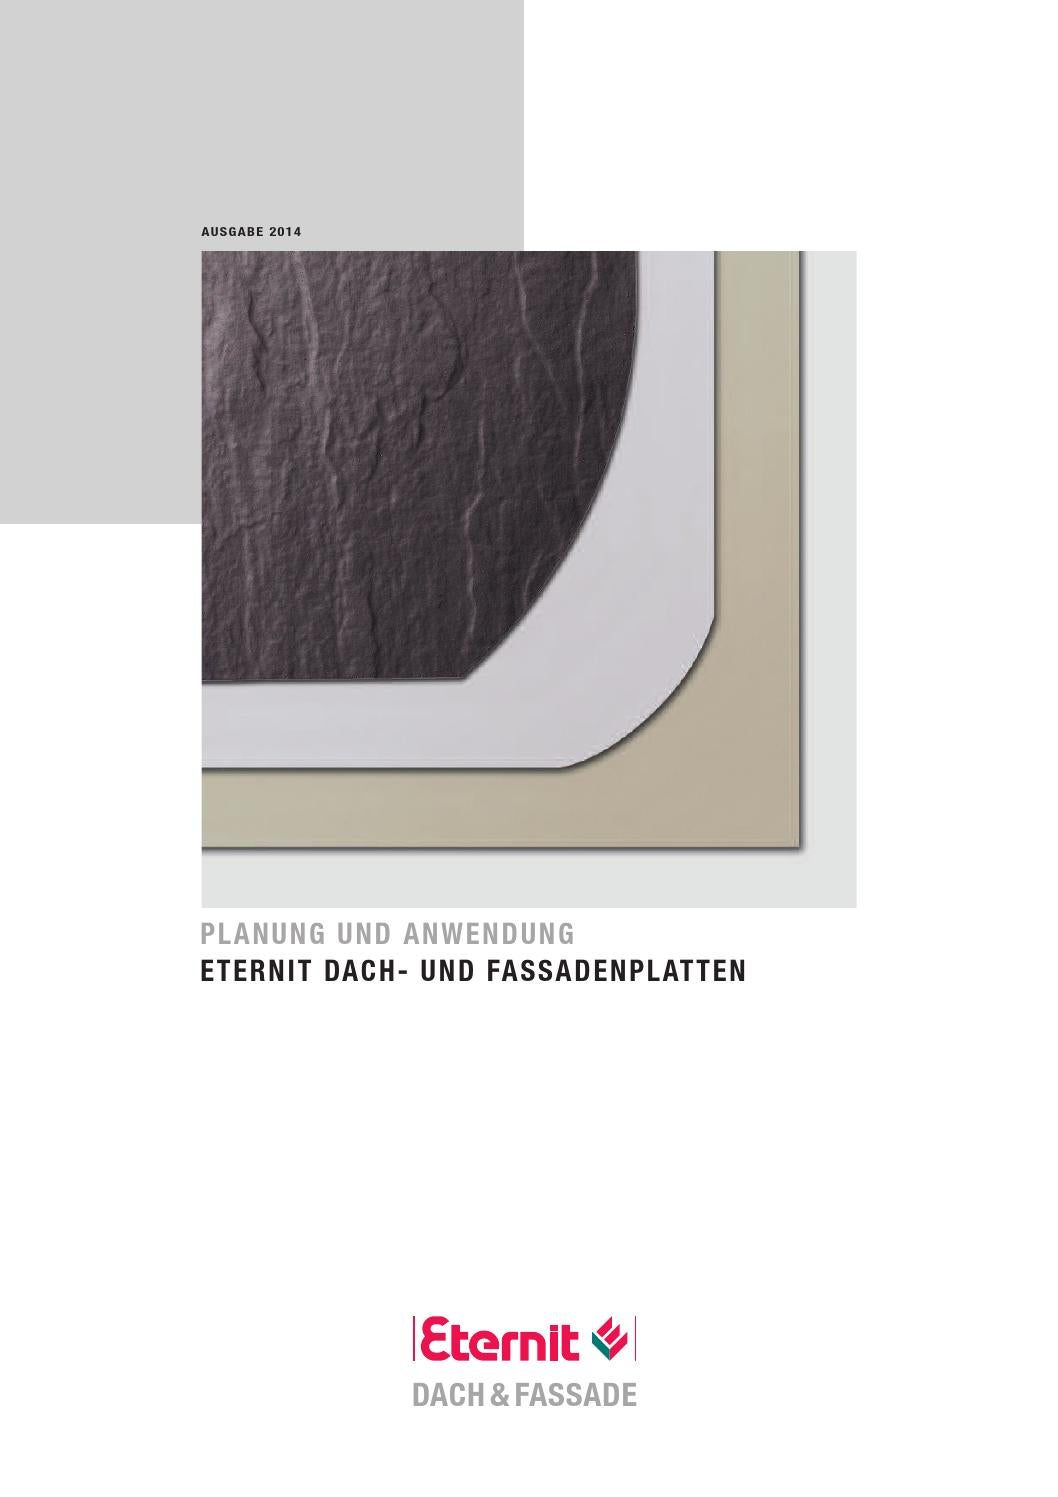 eternit dach planung und anwendung dachplatten 2014 by. Black Bedroom Furniture Sets. Home Design Ideas